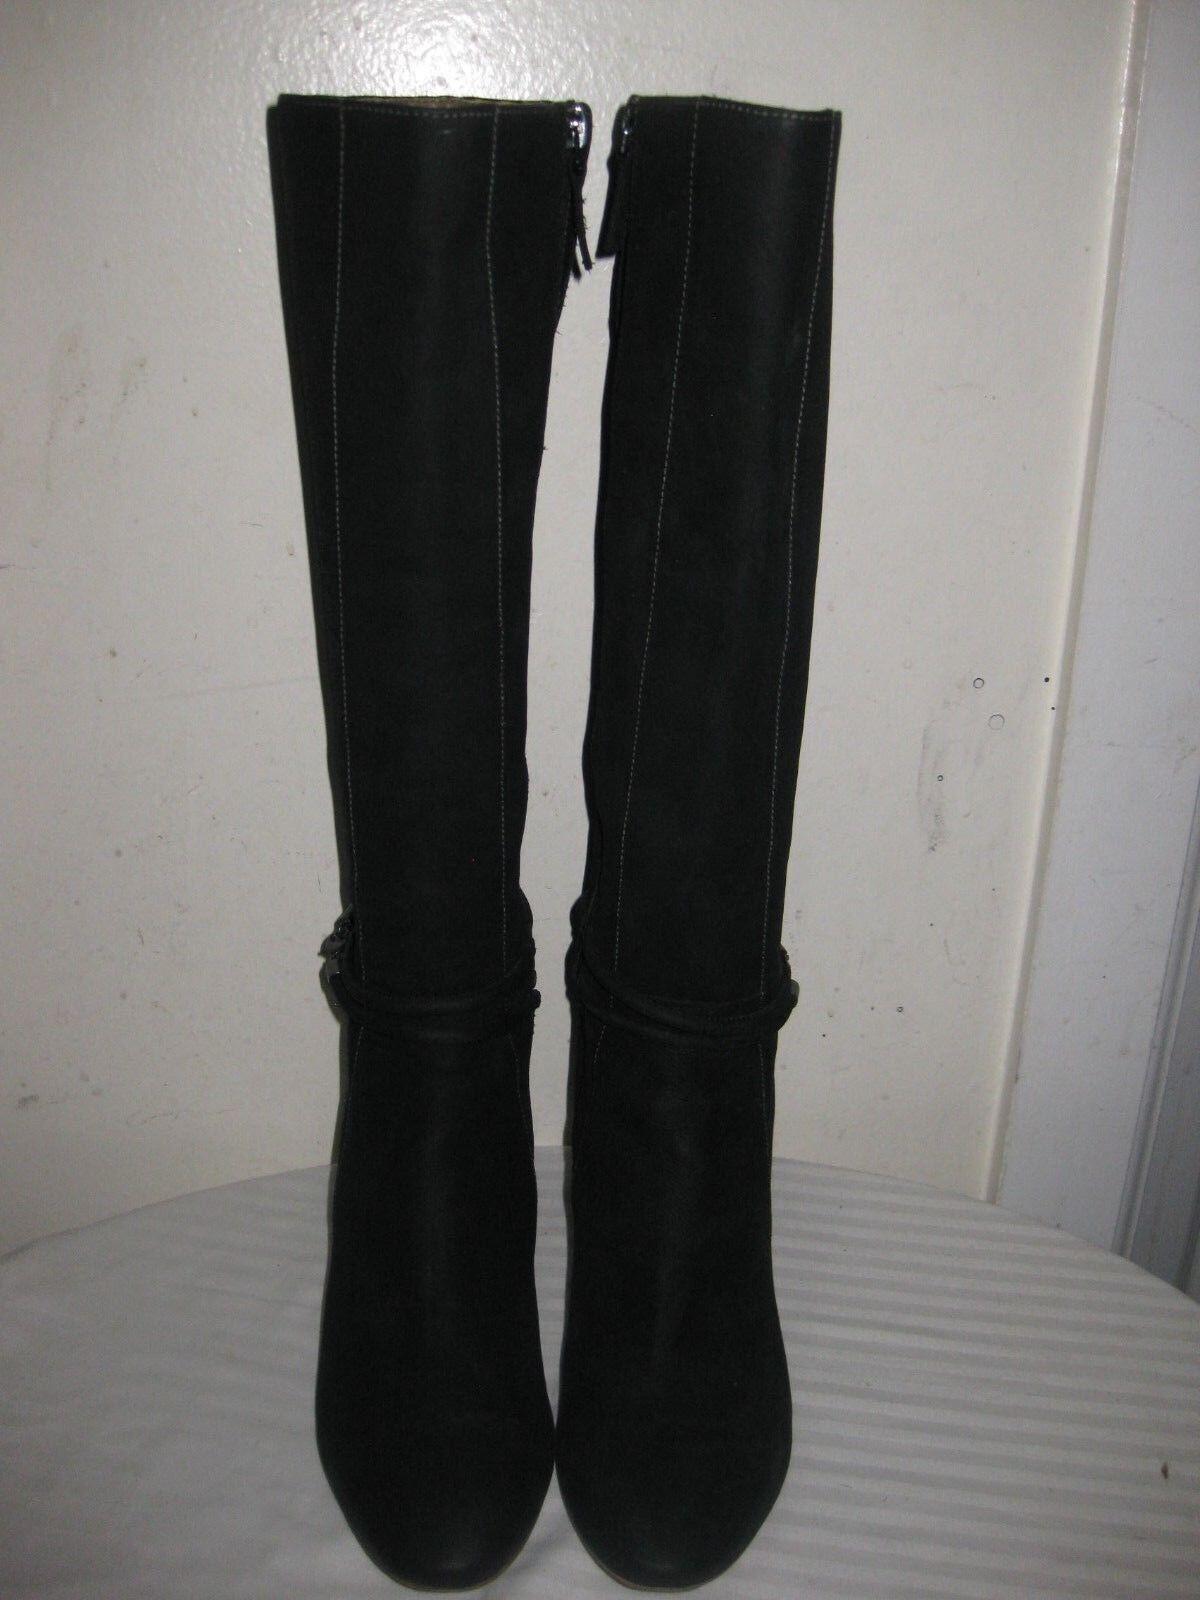 ECCO Leather Knee high Black Black Black Boots Women's shoes Size 40   9.5 54e86b